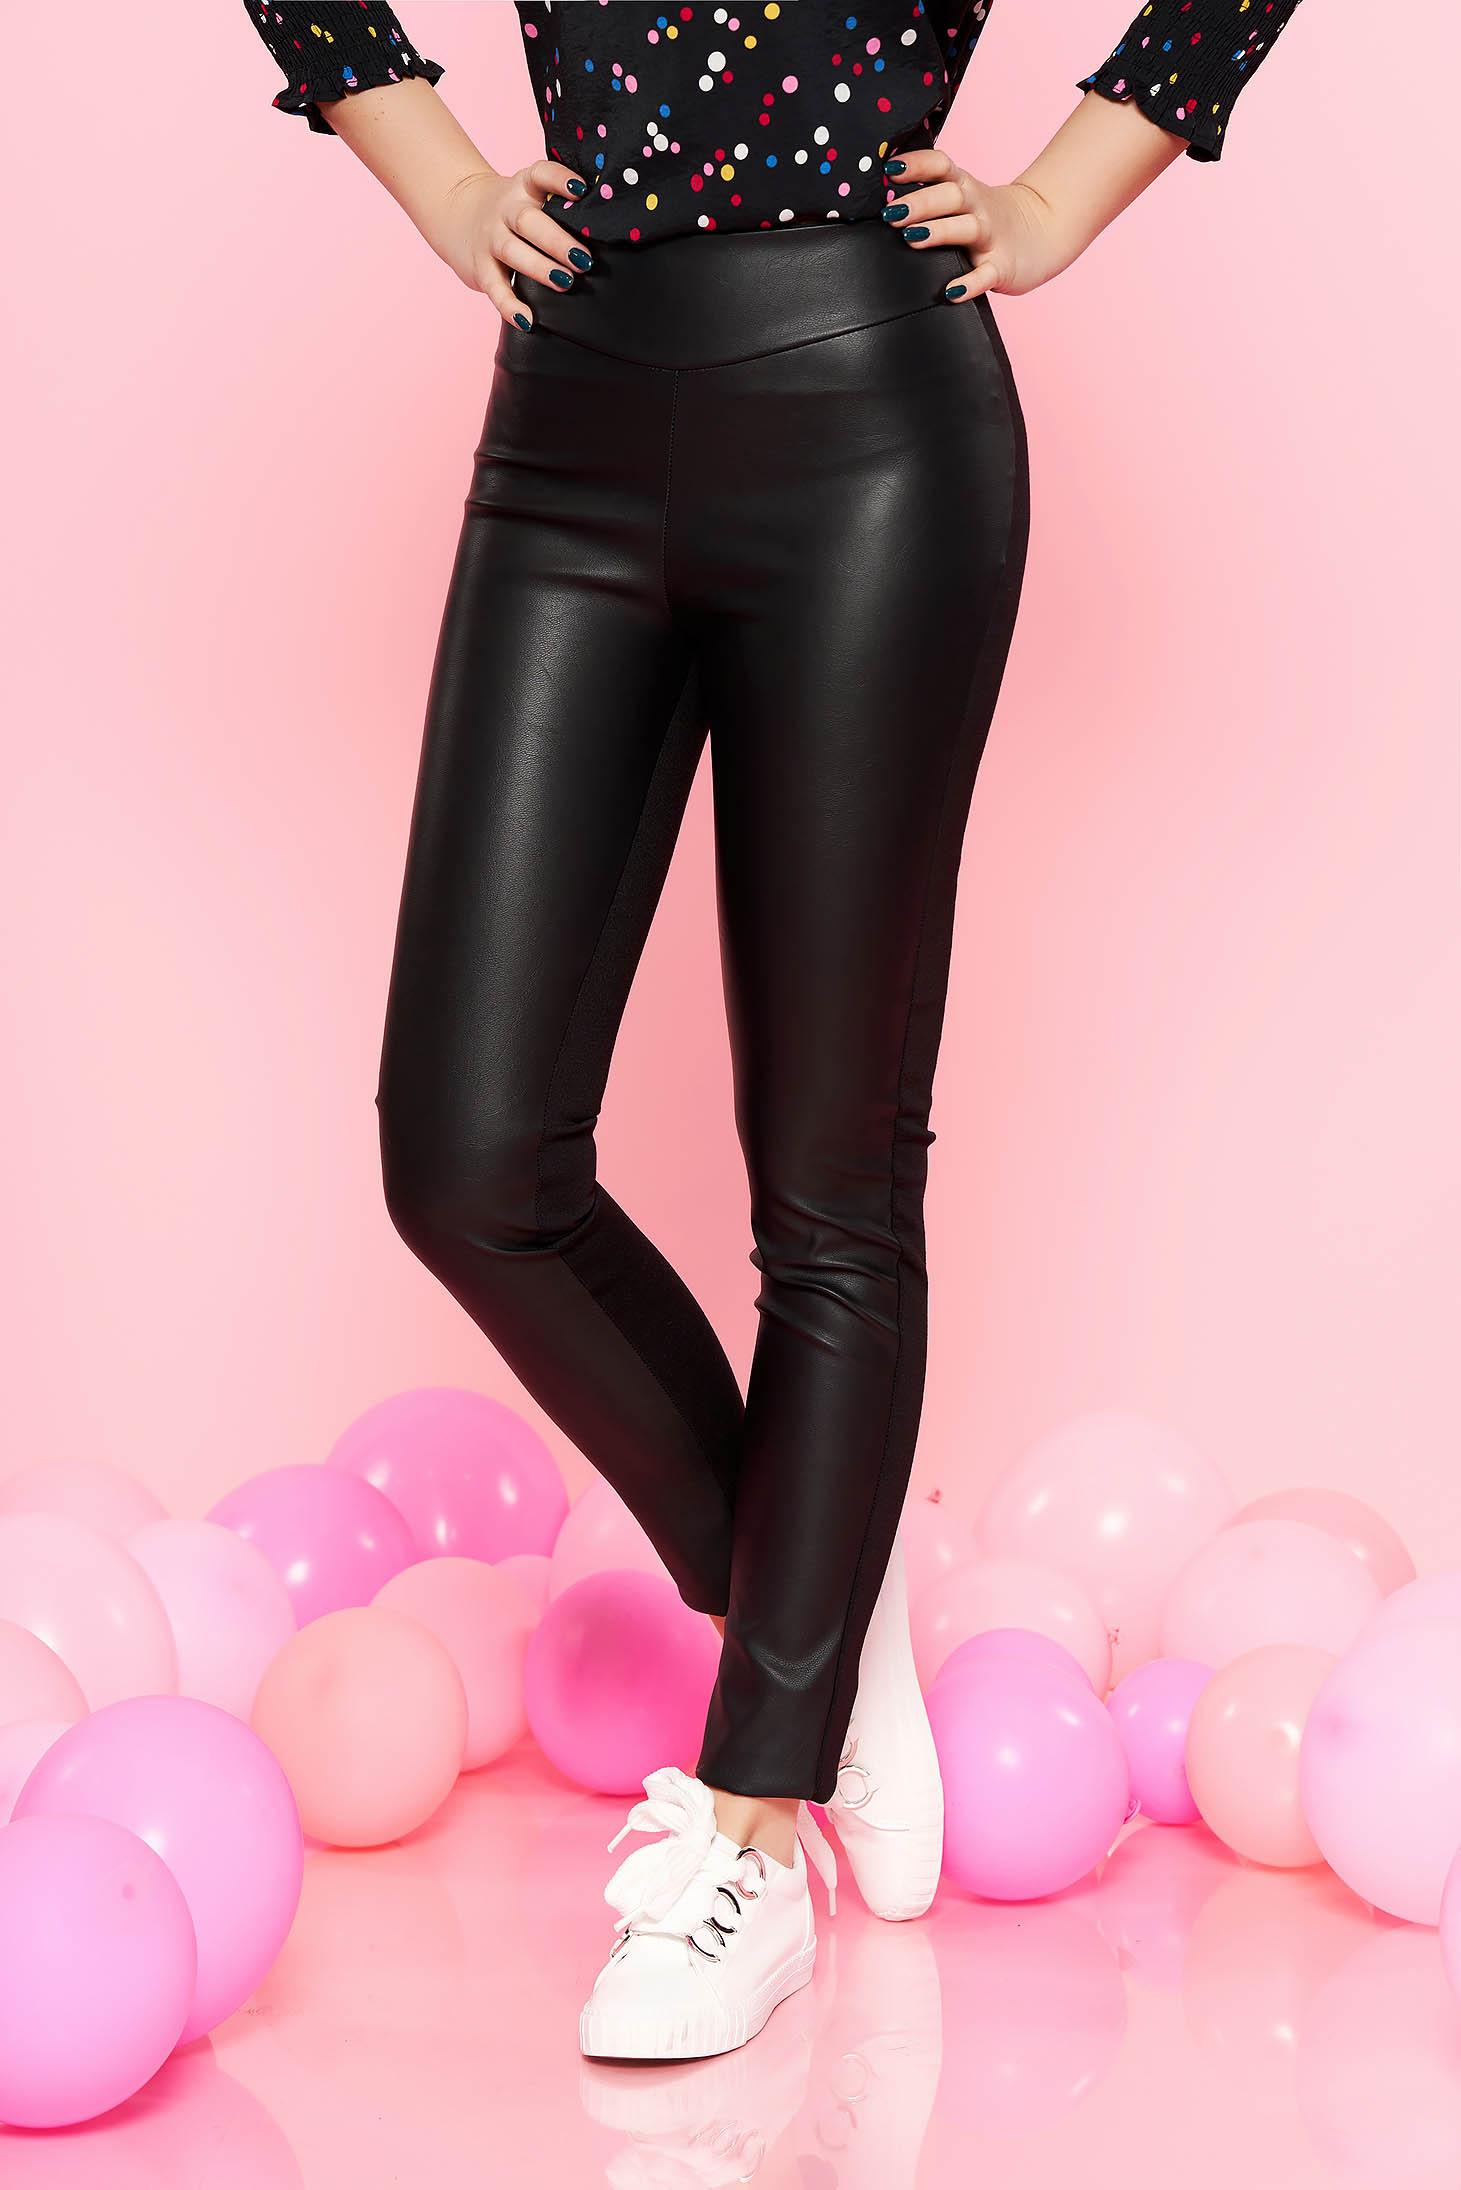 f92a6ff84e Fekete PrettyGirl casual magas derekú nadrág műbőr és pamutból derékban  rugalmas